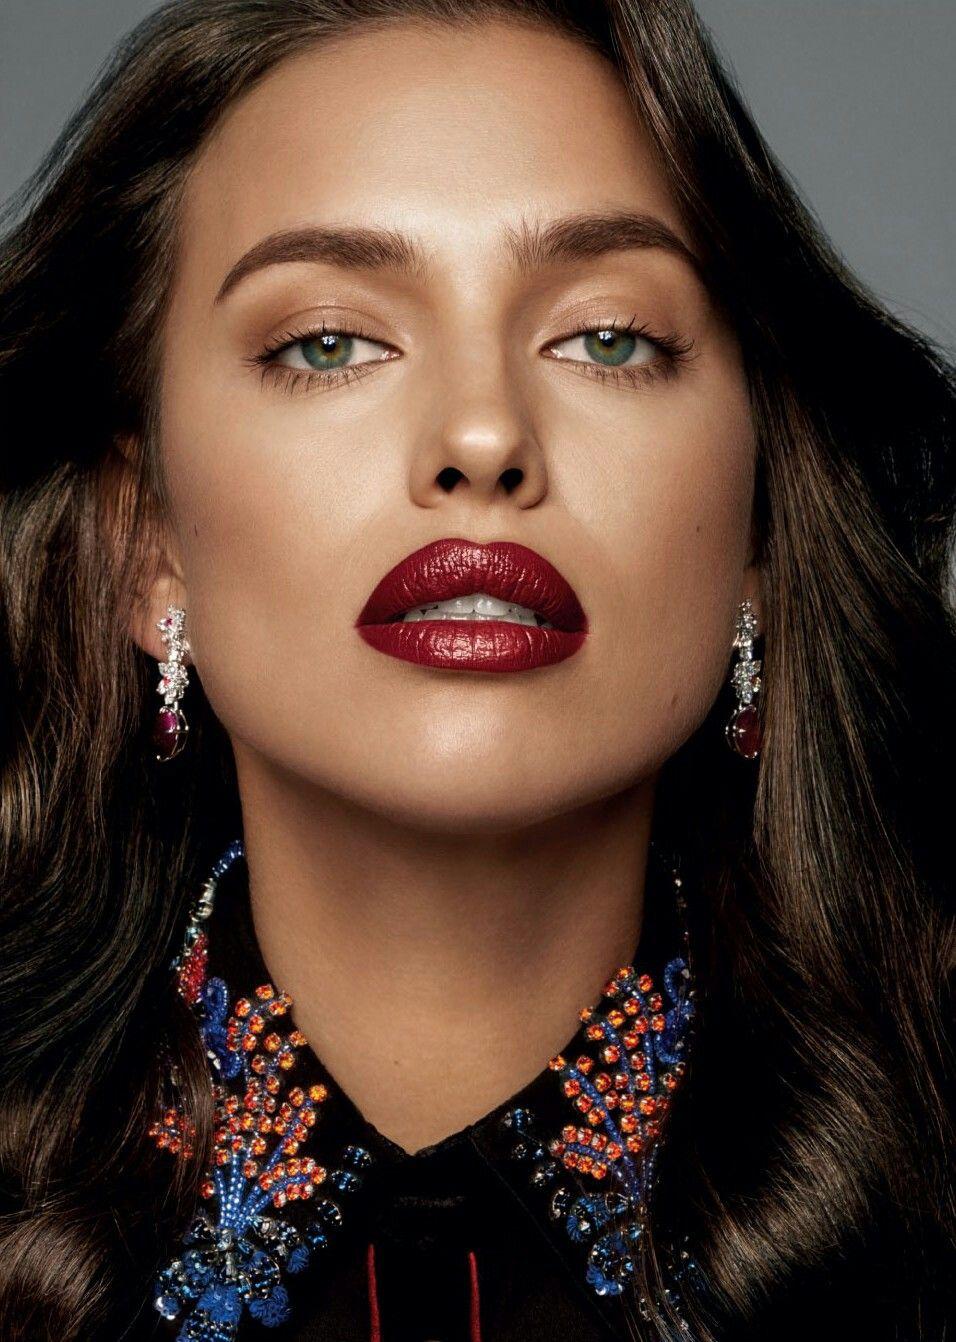 Irina Shayk for Glamour Russia October 2016